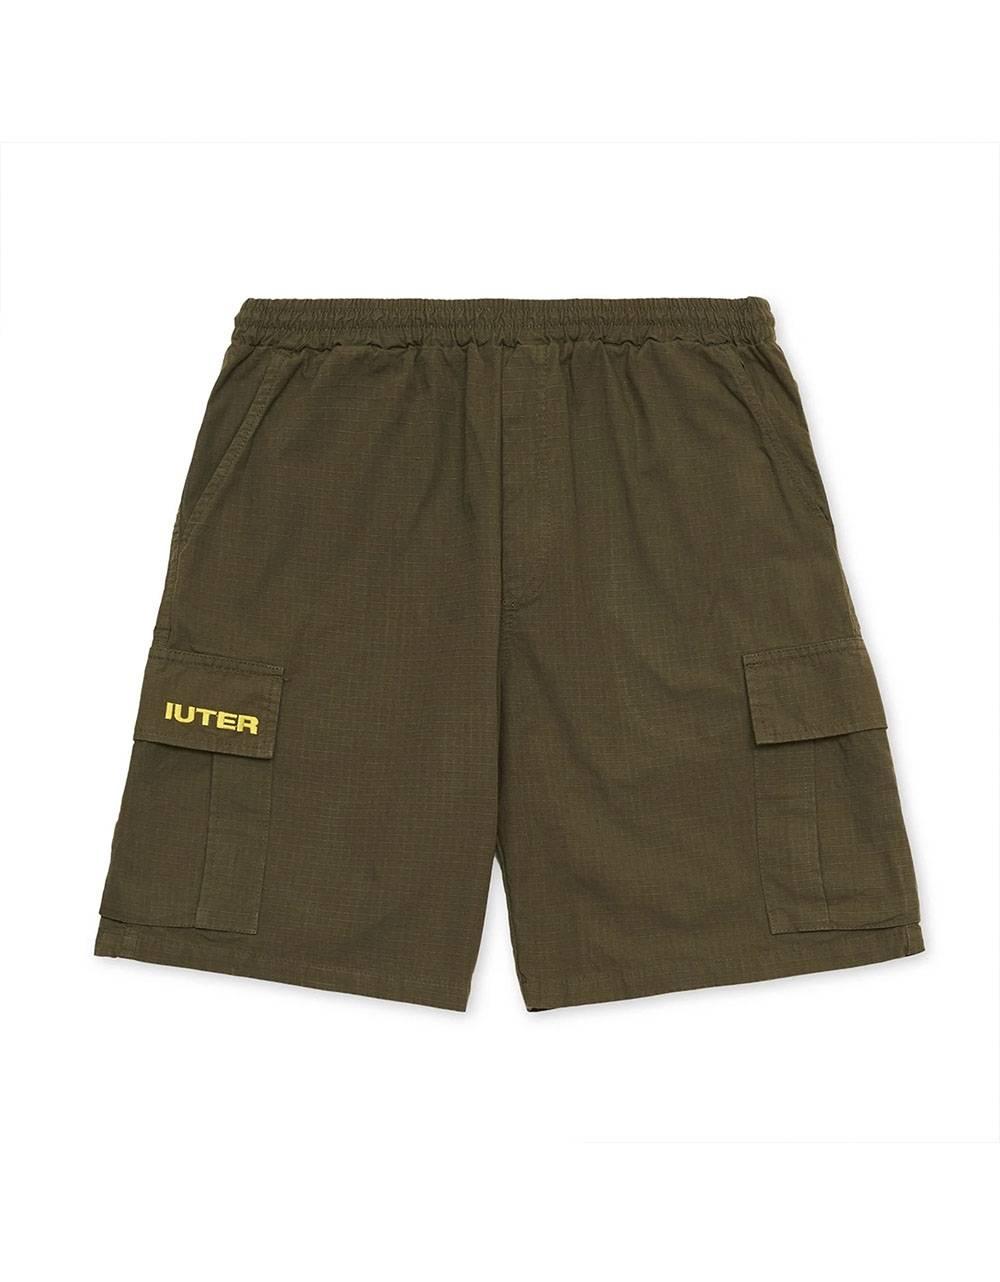 Iuter Ripstop Cargo shorts - army IUTER Shorts 75,41€